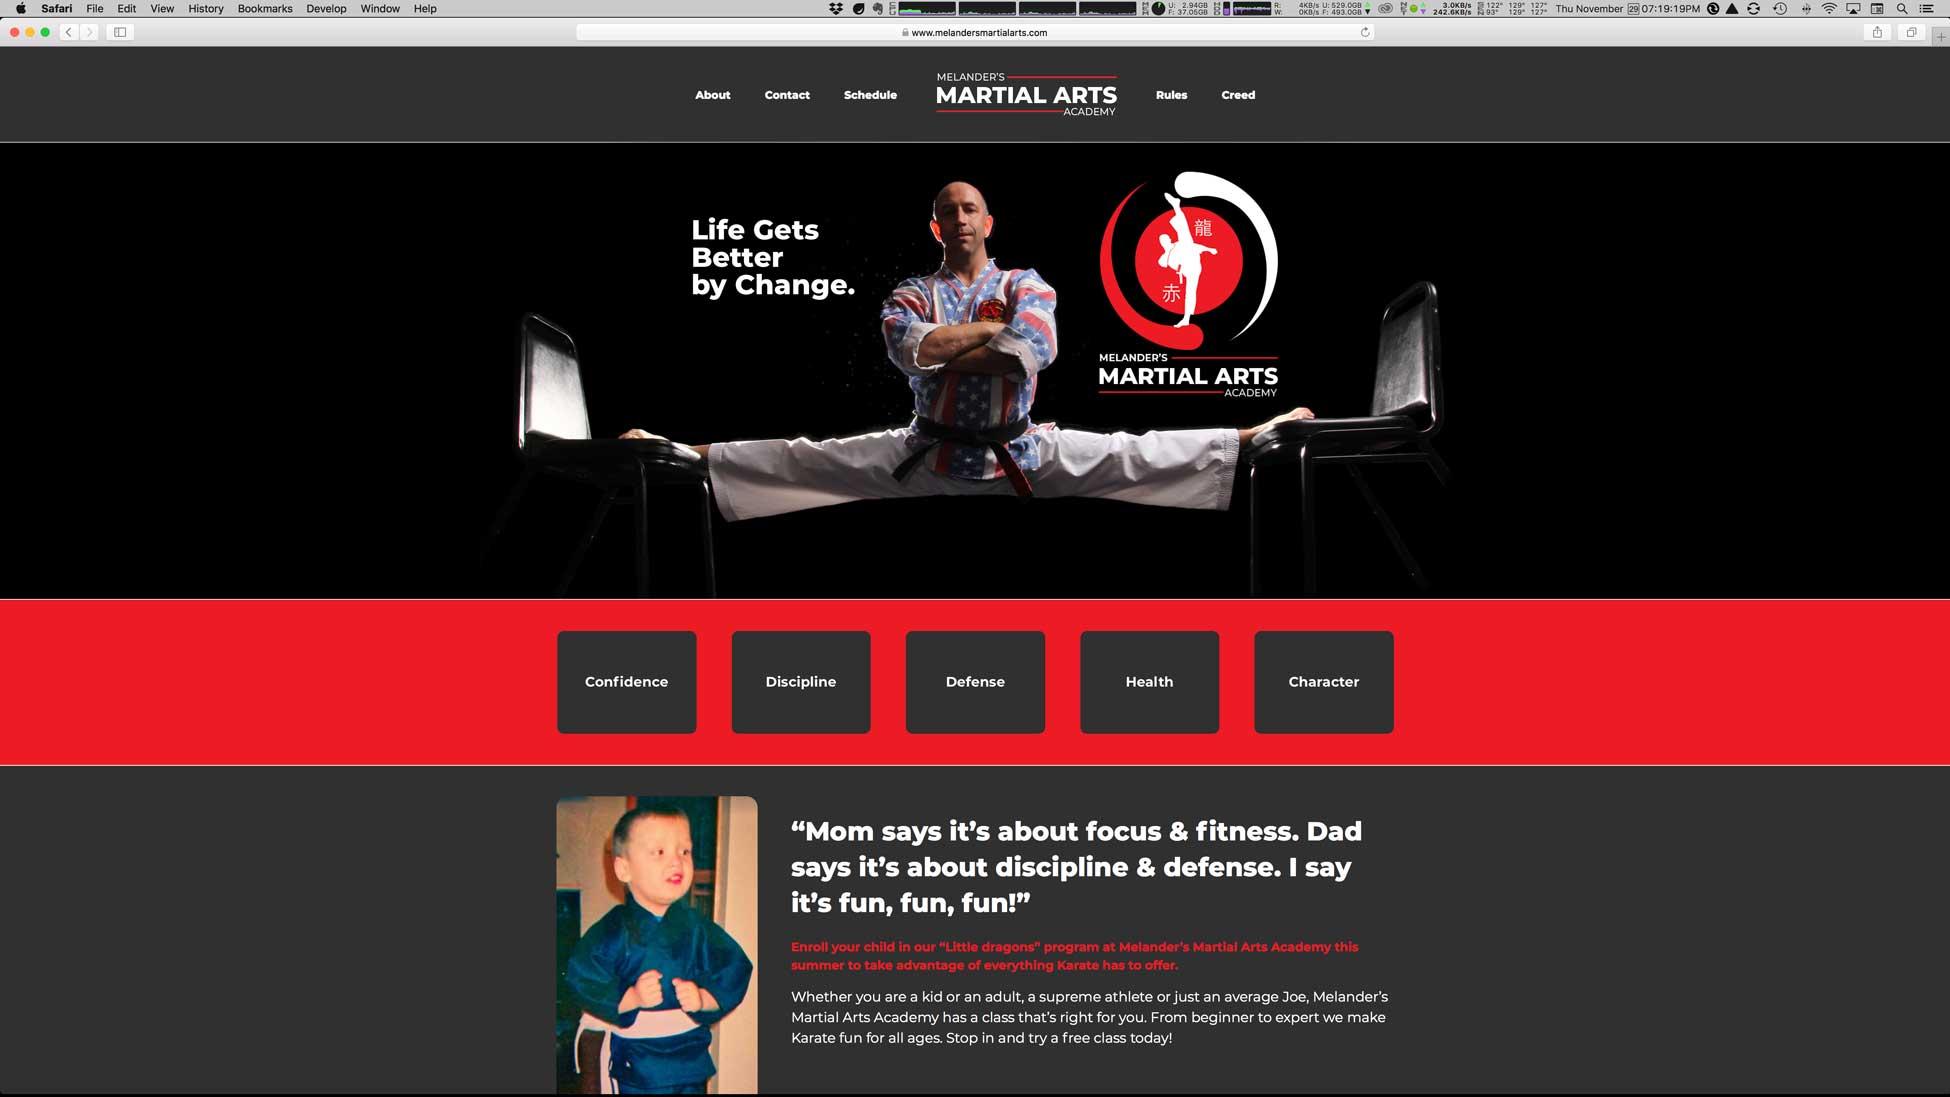 Melander's Martial Arts Academy :: Website Design, Logo and Branding